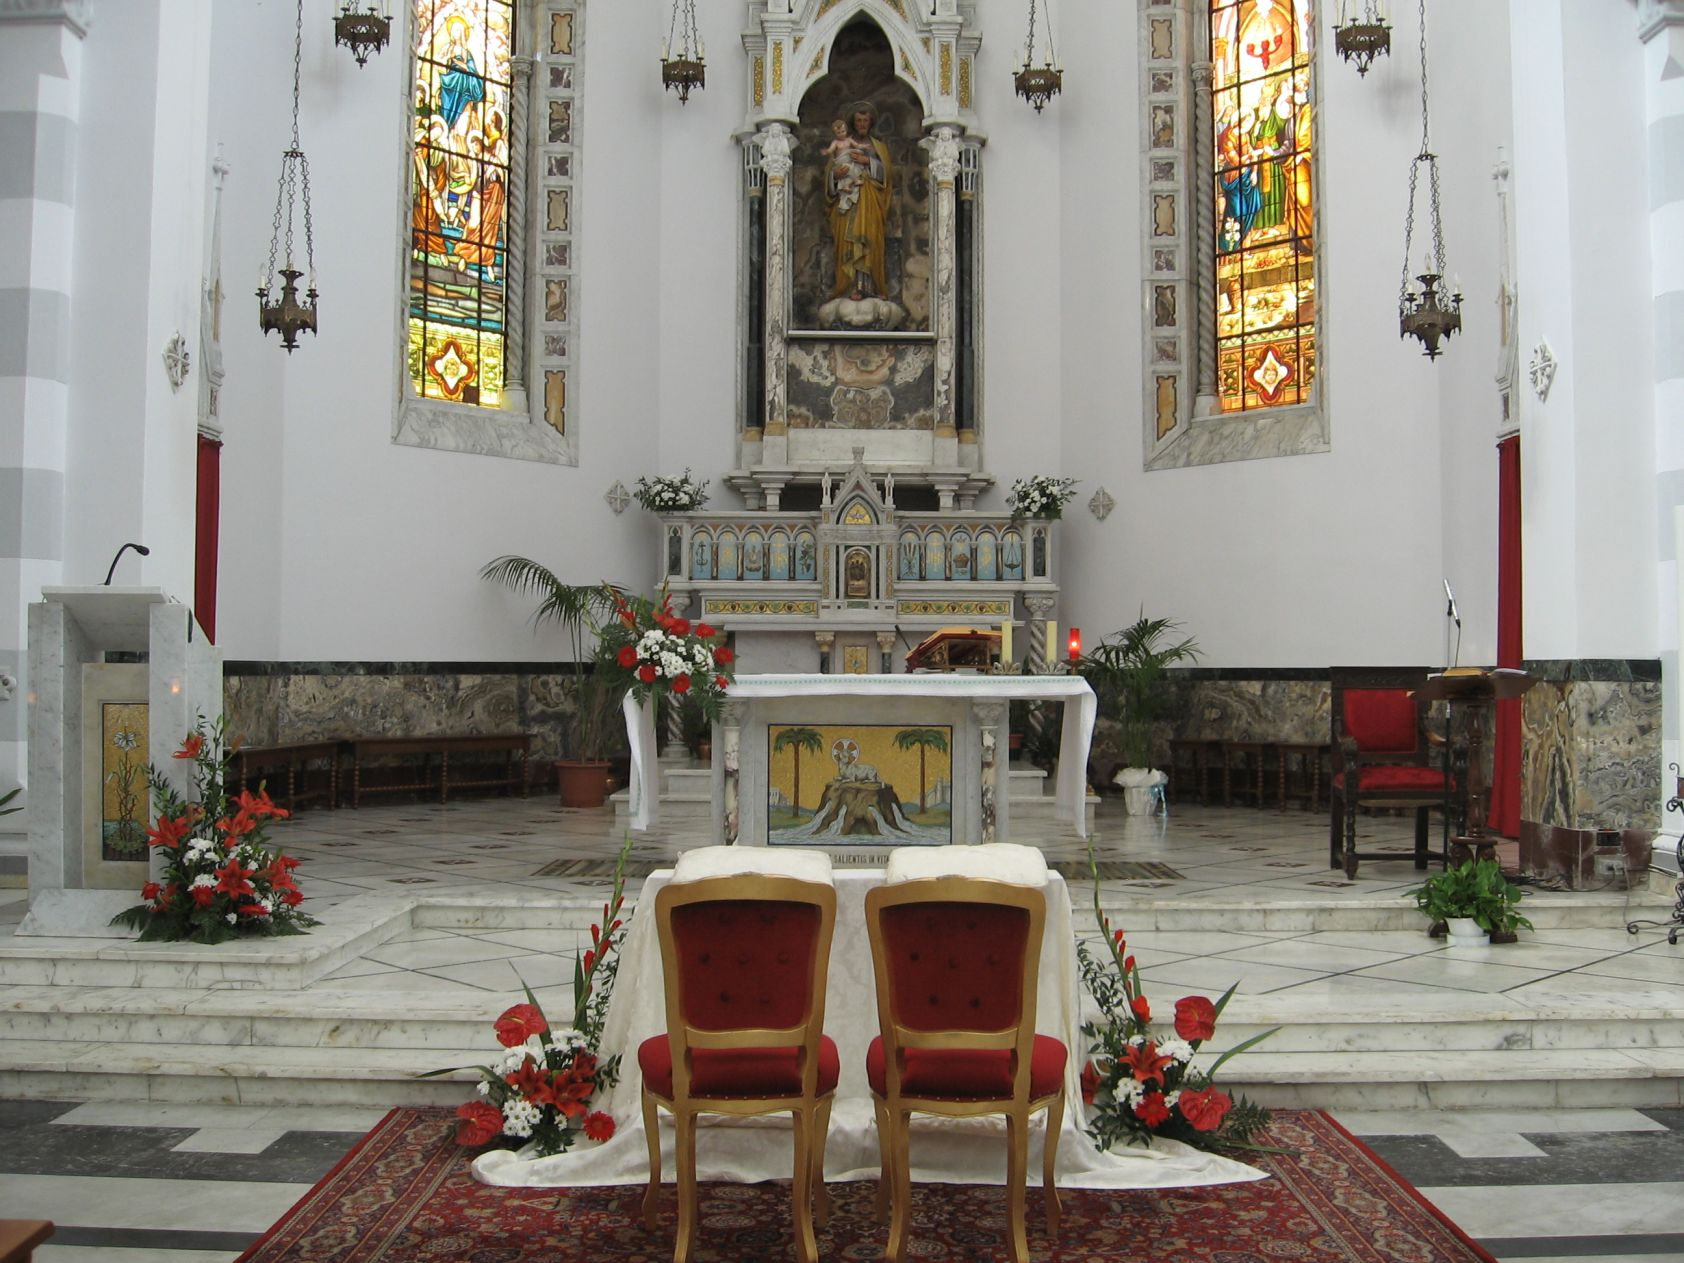 Chiesa-cinquantesimo-2009-07-19-12.08.06